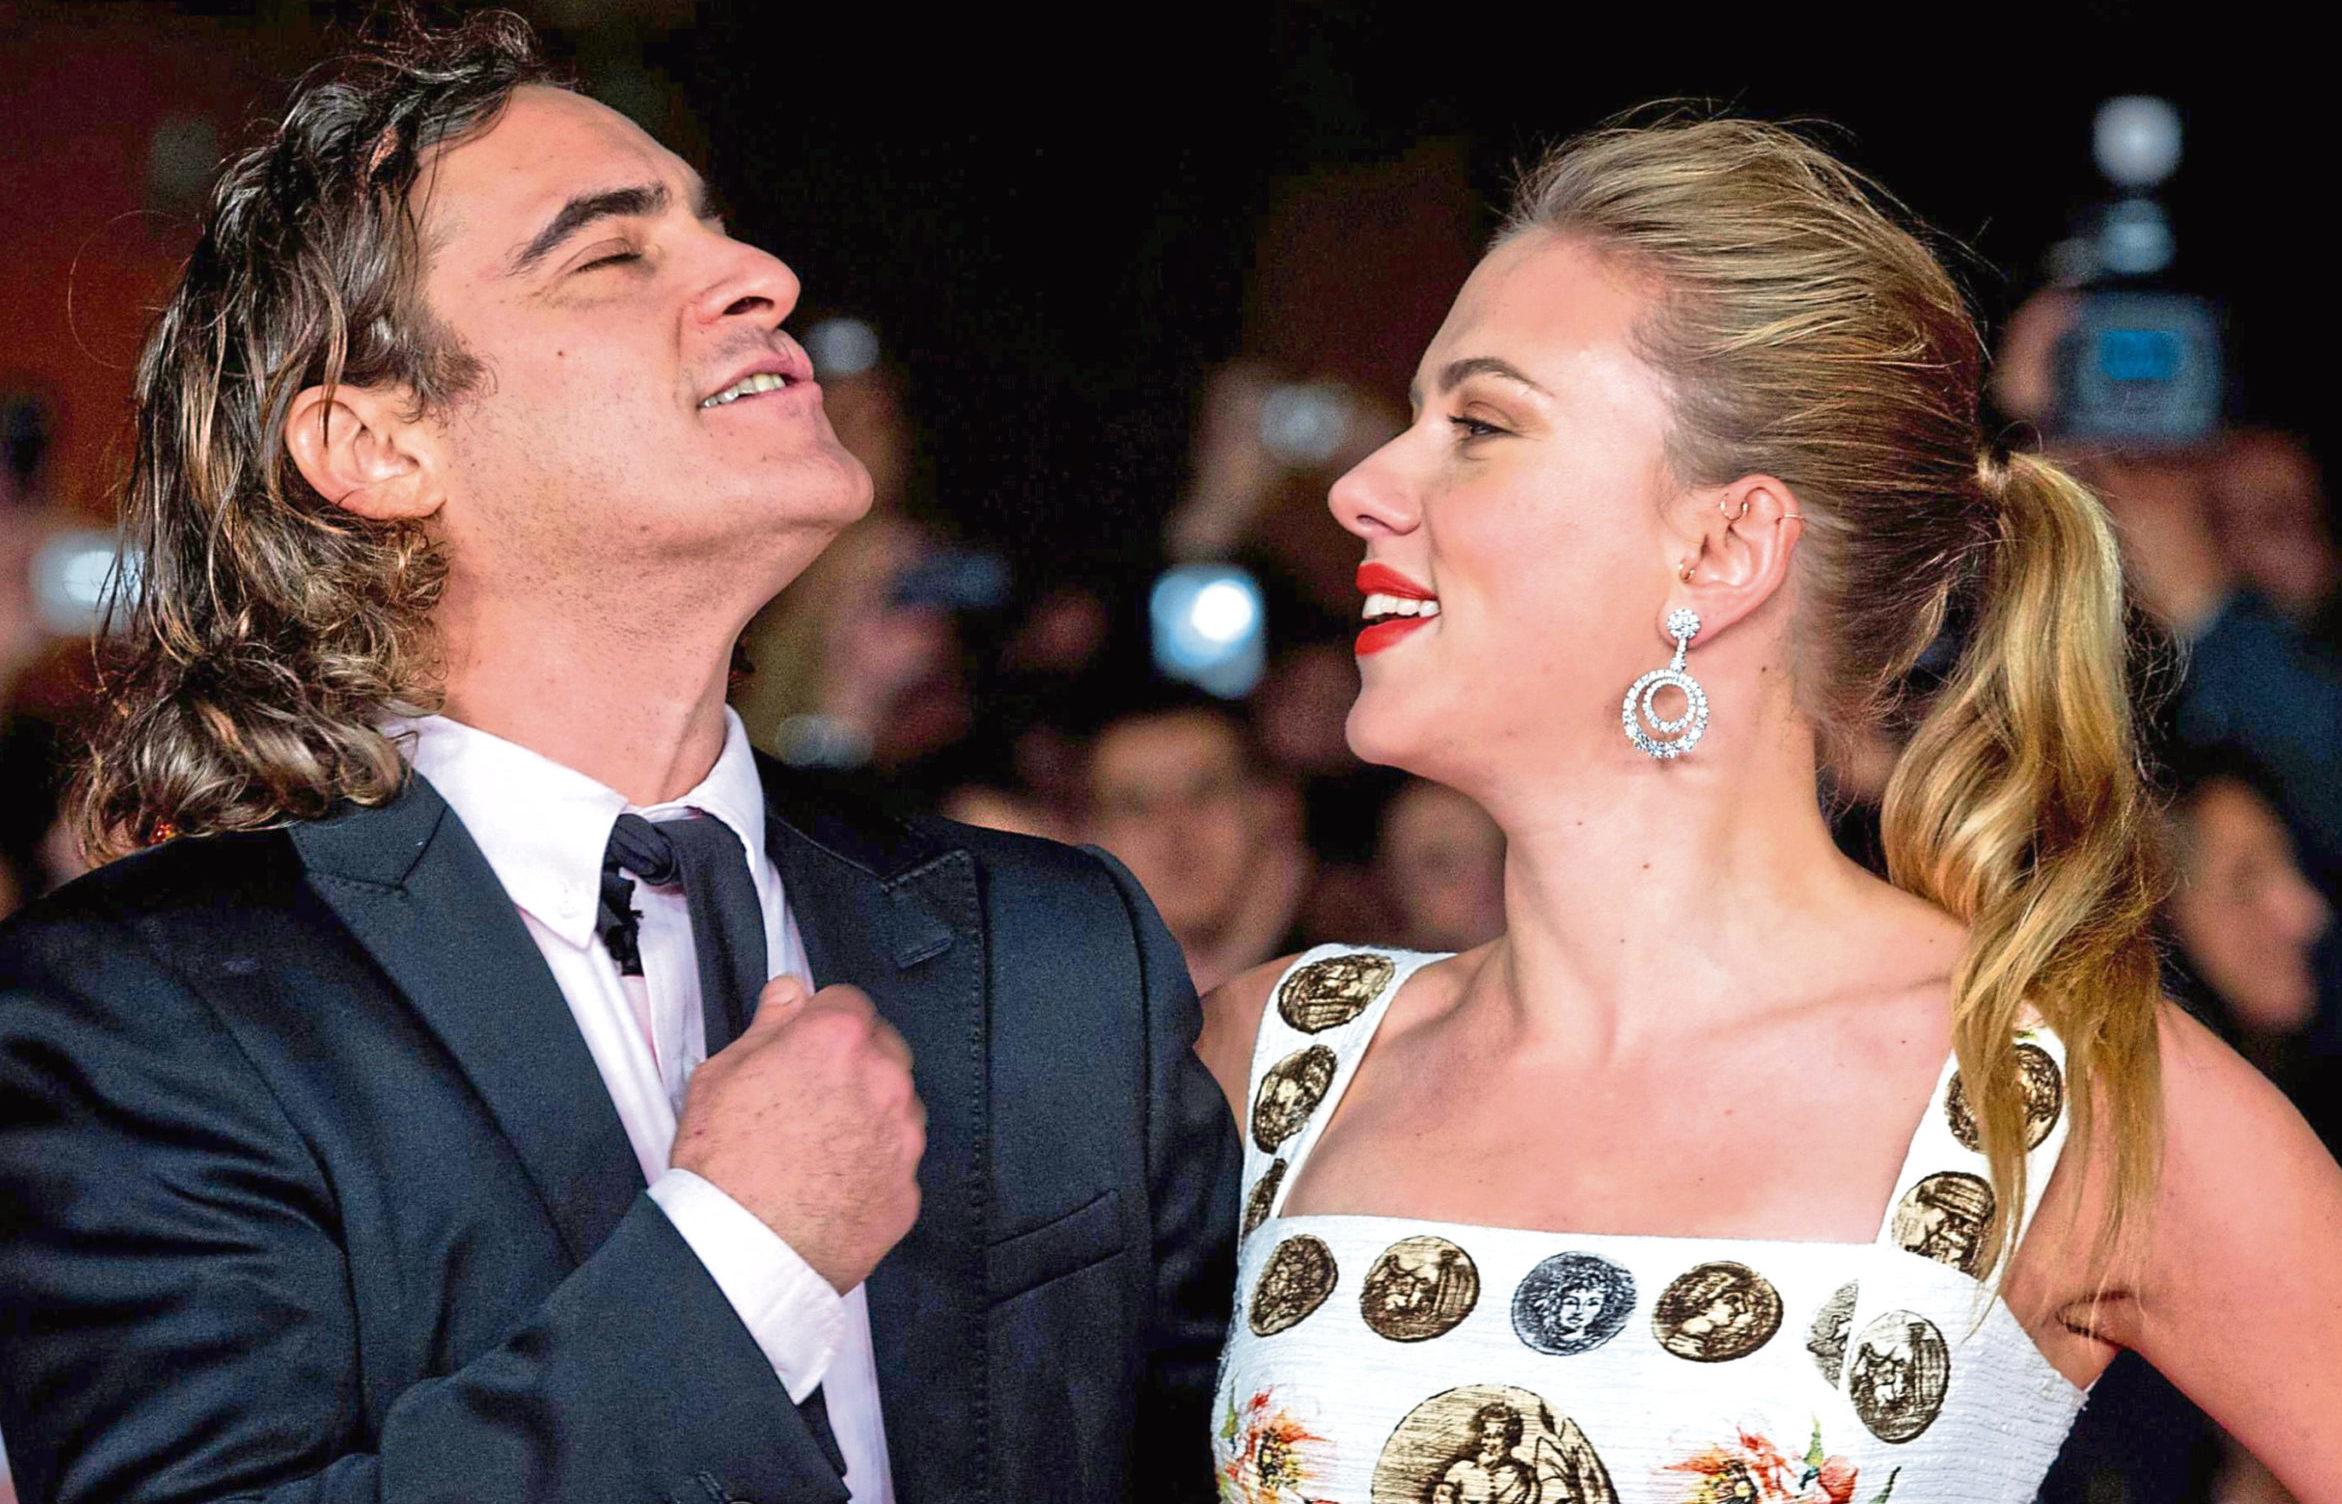 Joaquin Phoenix and Scarlett Johansson are hoping to win big